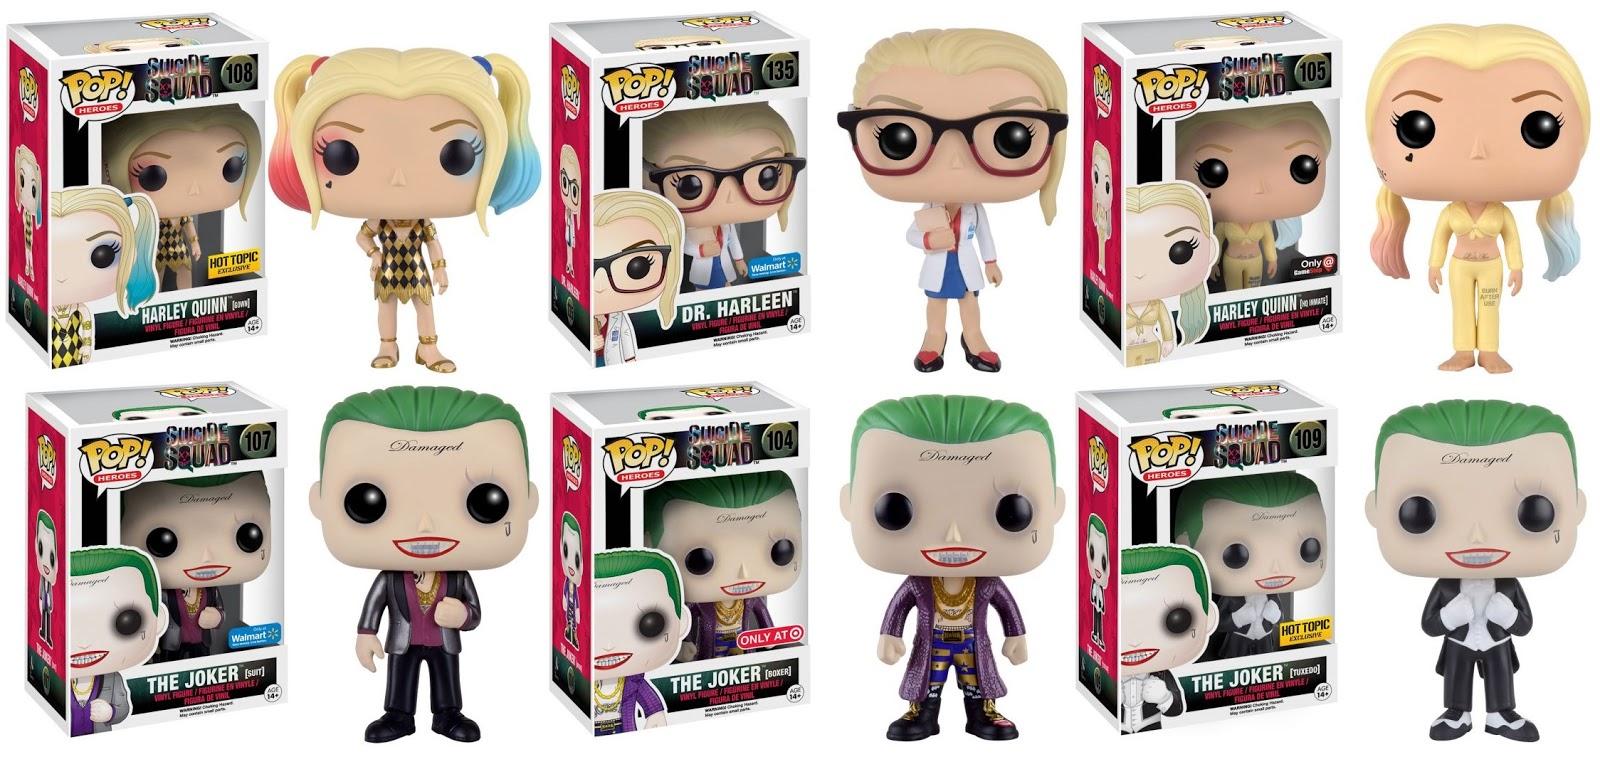 The Blot Says Suicide Squad Retailer Exclusive Harley Quinn Bott Funko Pop Emperors Kronk Joker Figure Variants By